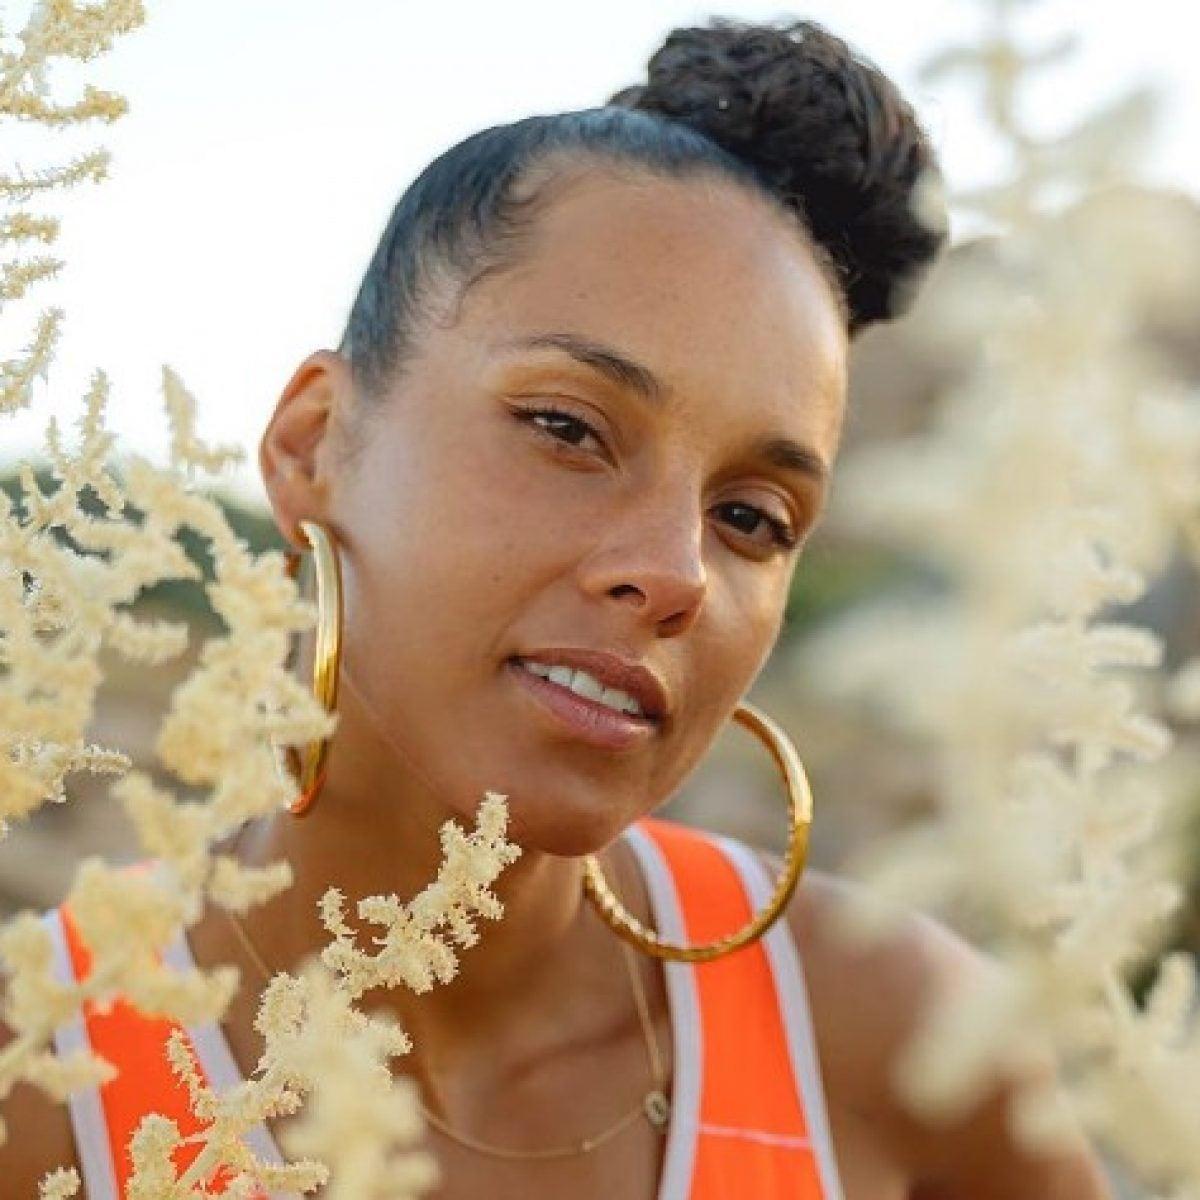 Alicia Keys, Monica, Erykah Badu And Other Celebrity Beauty Looks Of The Week